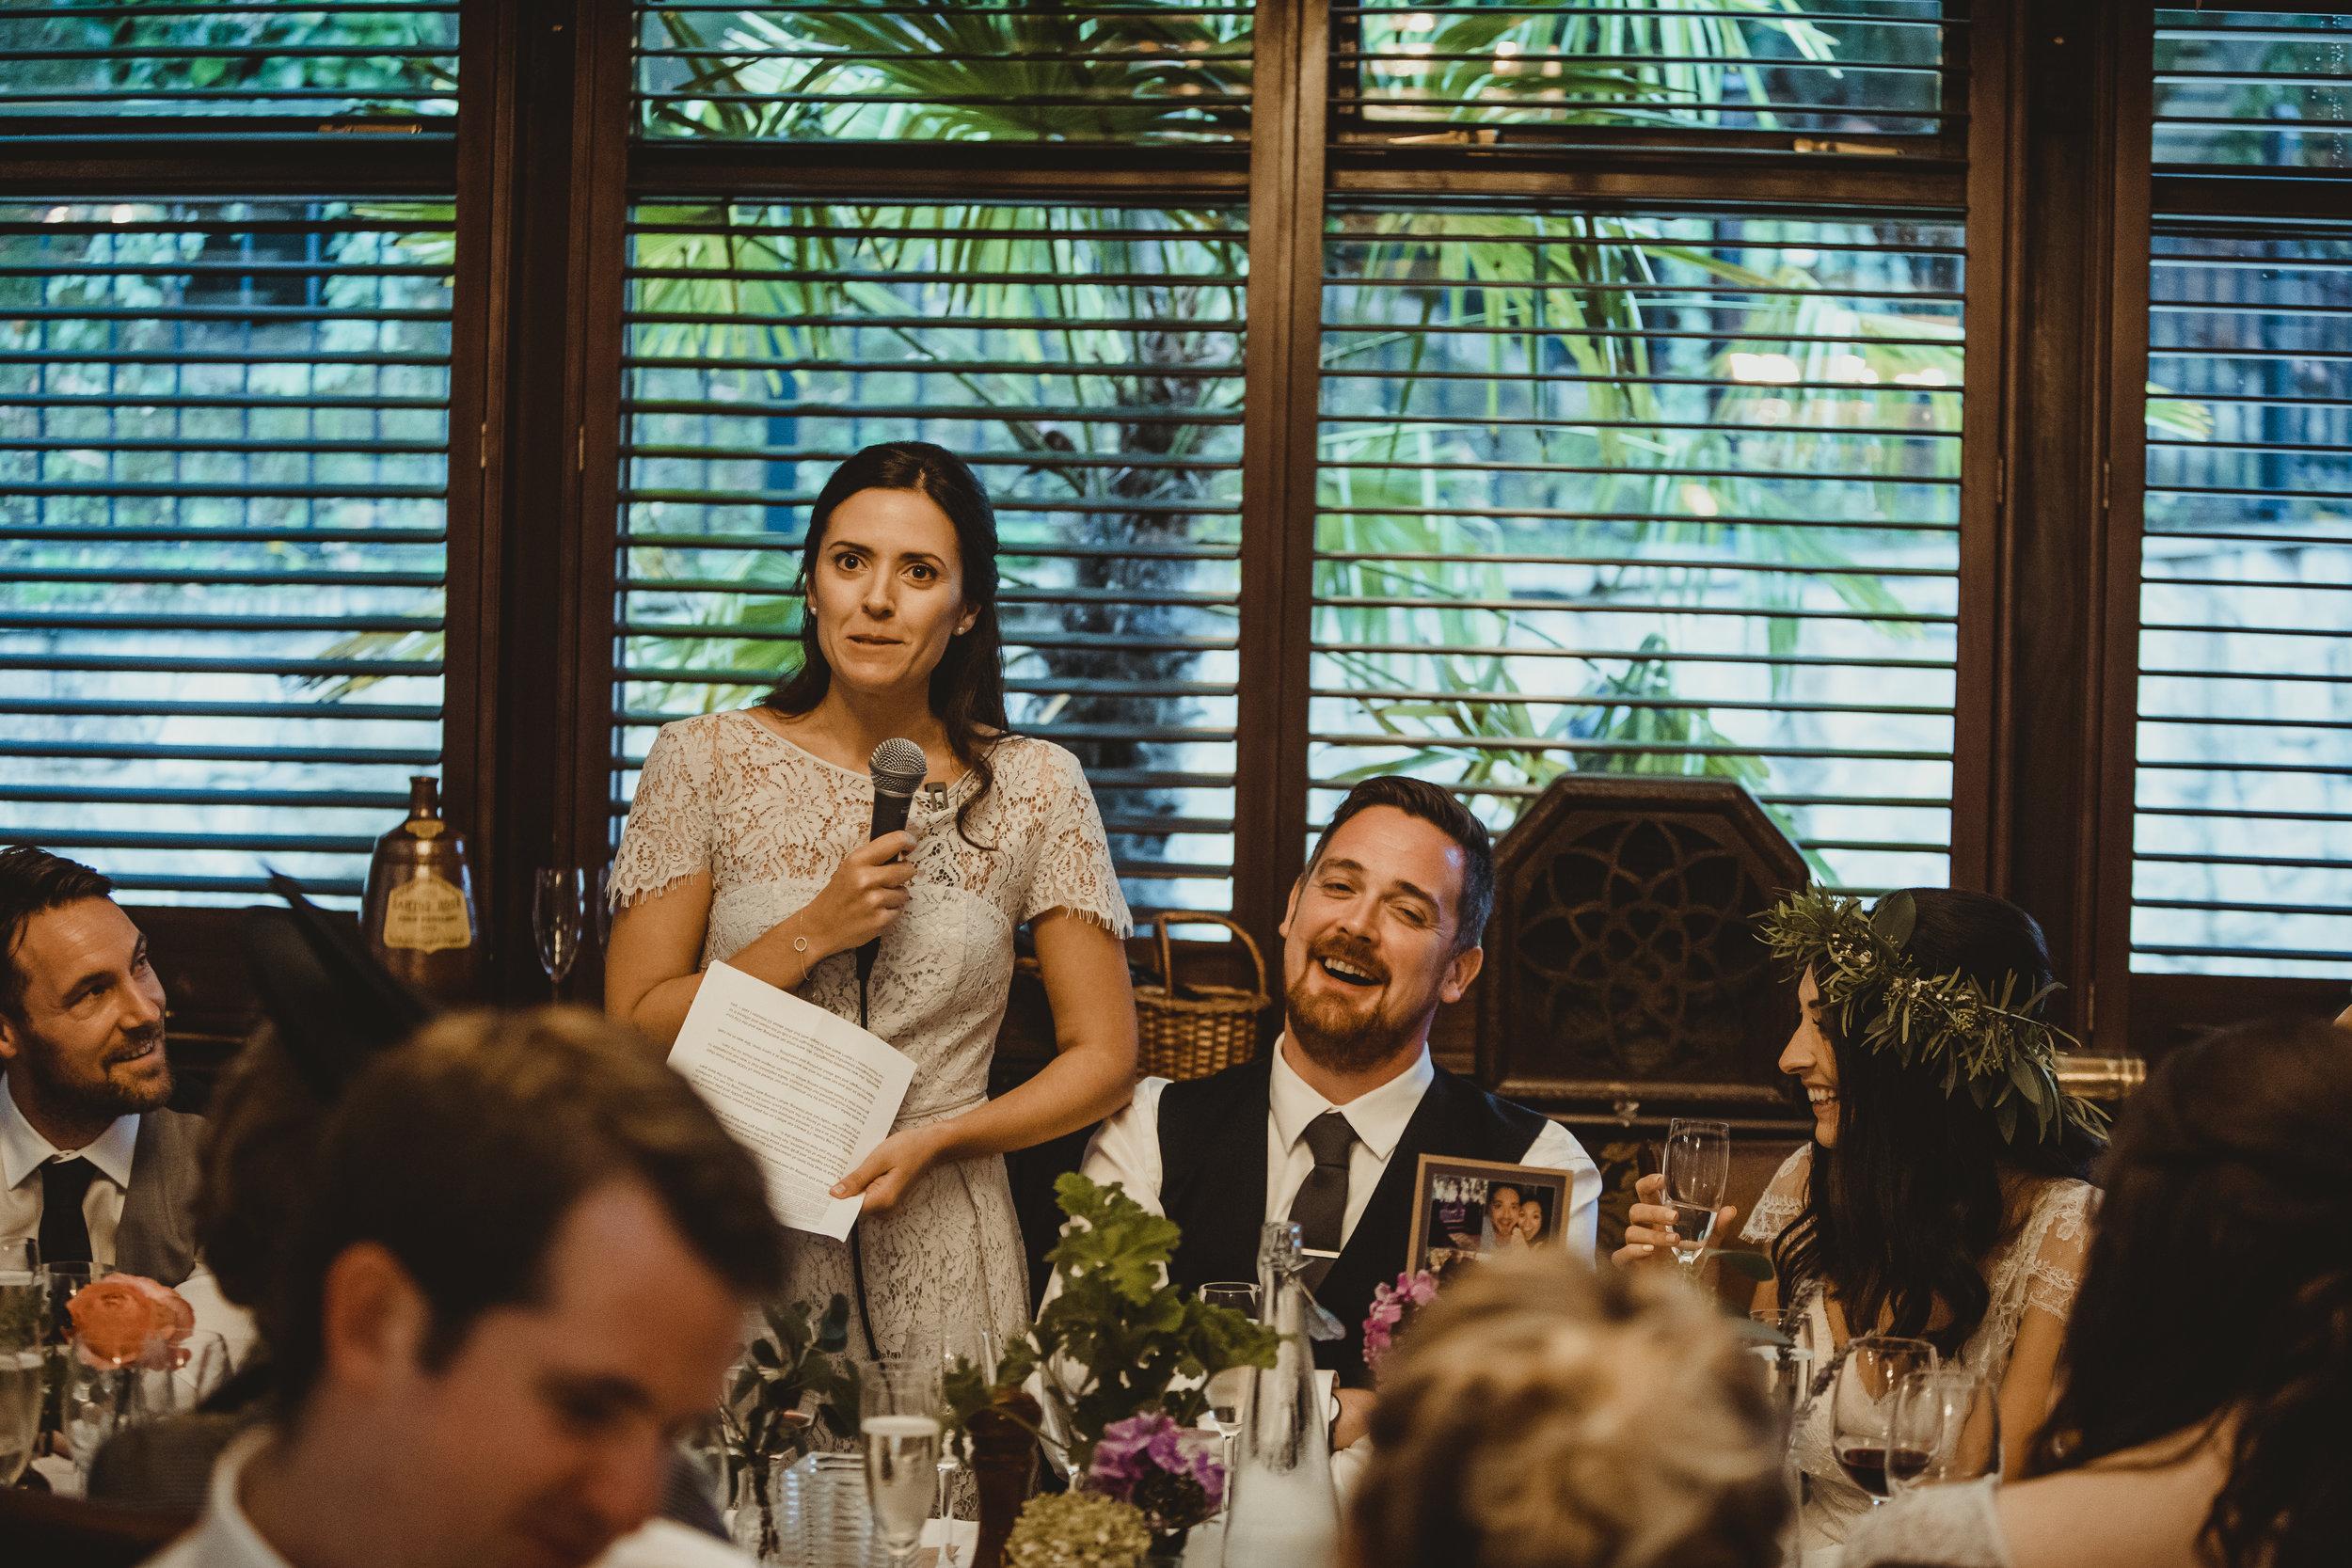 N&J_YORKSHIRE_WEDDING_PHOTOGRAPHER_MALTON_LEEDS_SHEFFIELD-731.JPG